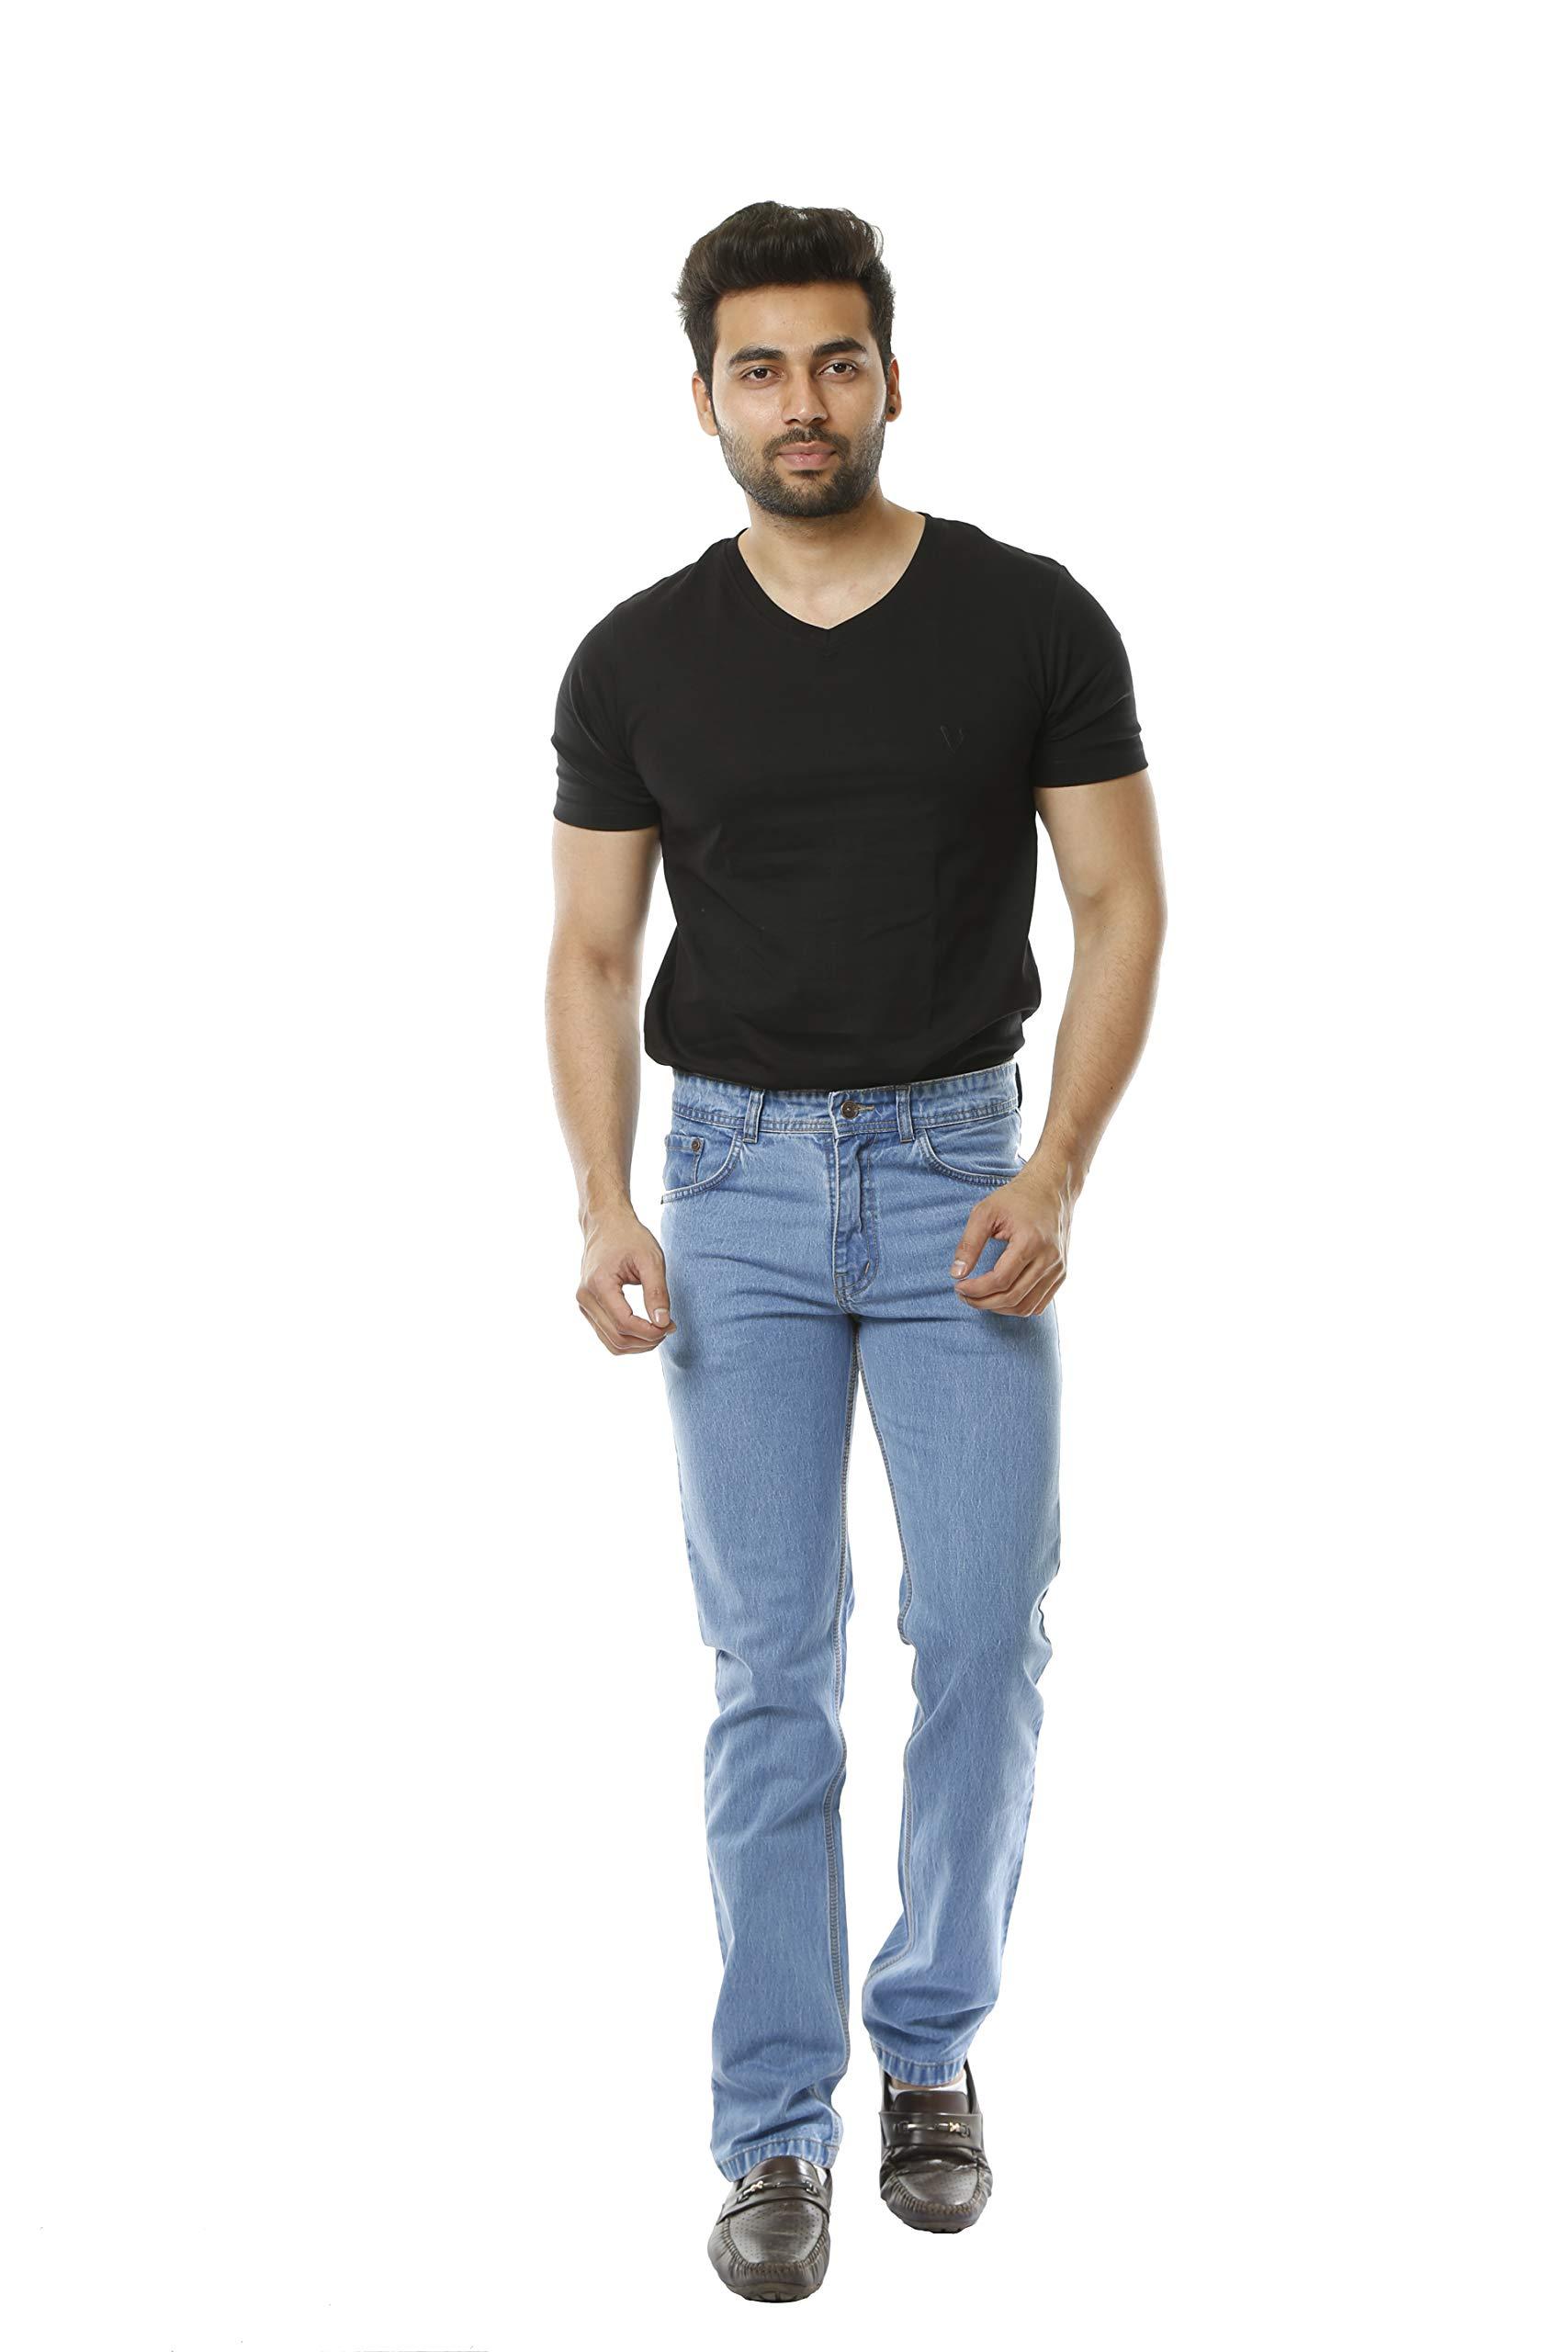 MARUTI STORE ONLINE Blue Jeans Denim for Men Comfortable Cotton Bottom Wear Straight Fit (Sky Blue, 30 x 43)